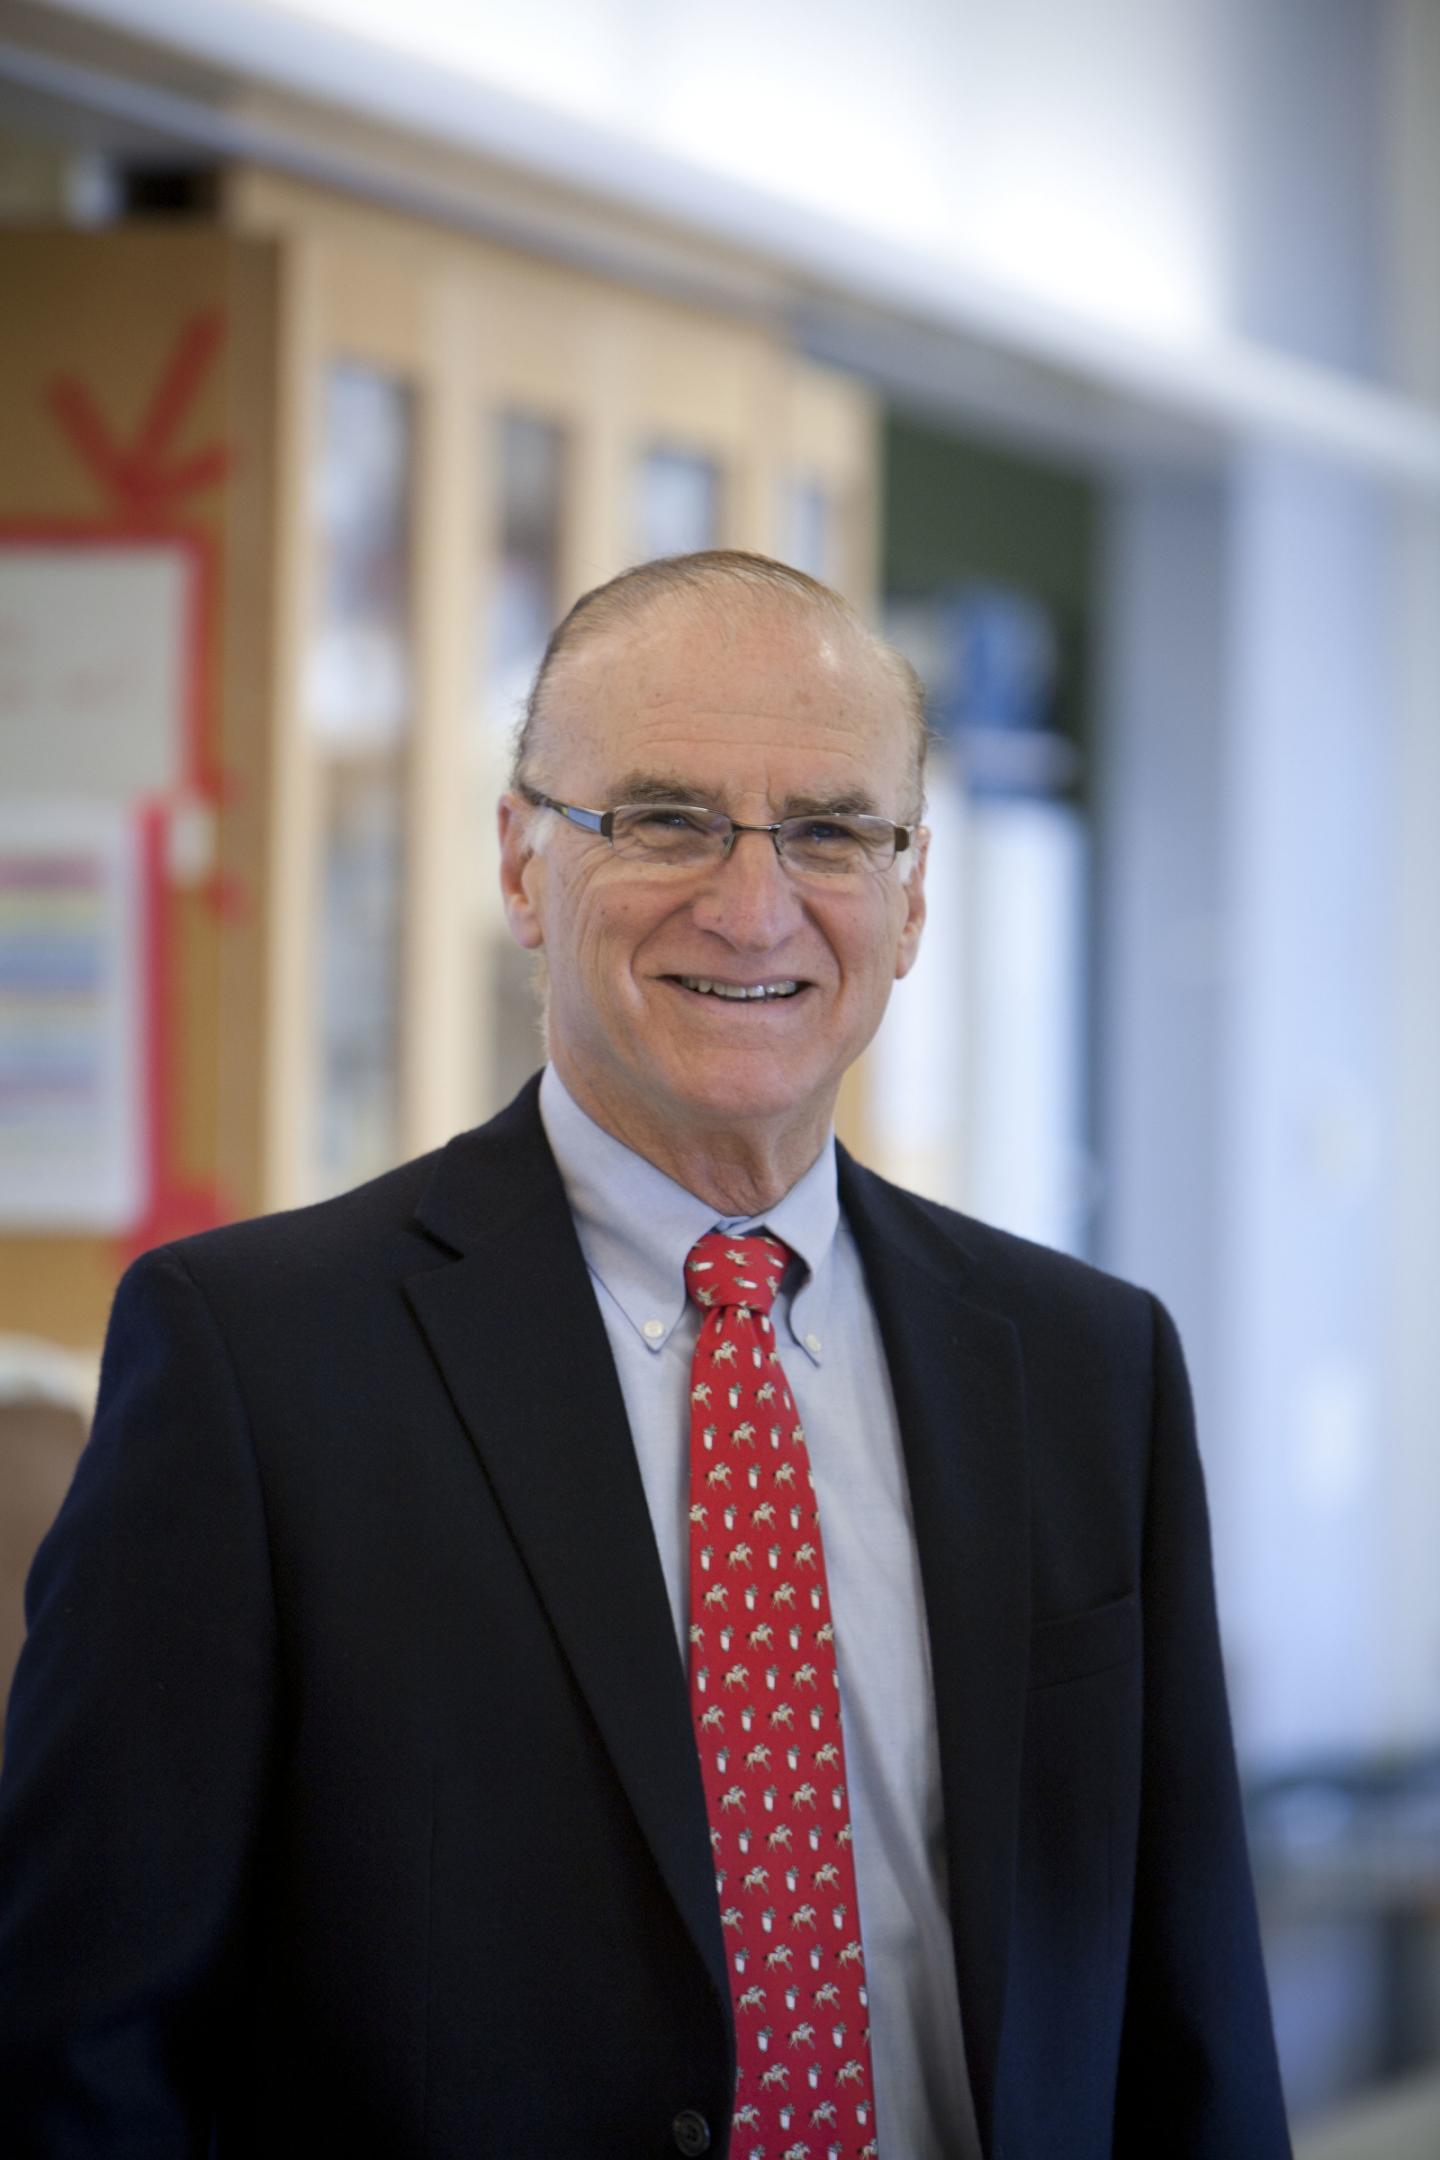 C. Ronald Kahn, M.D., Joslin Diabetes Center